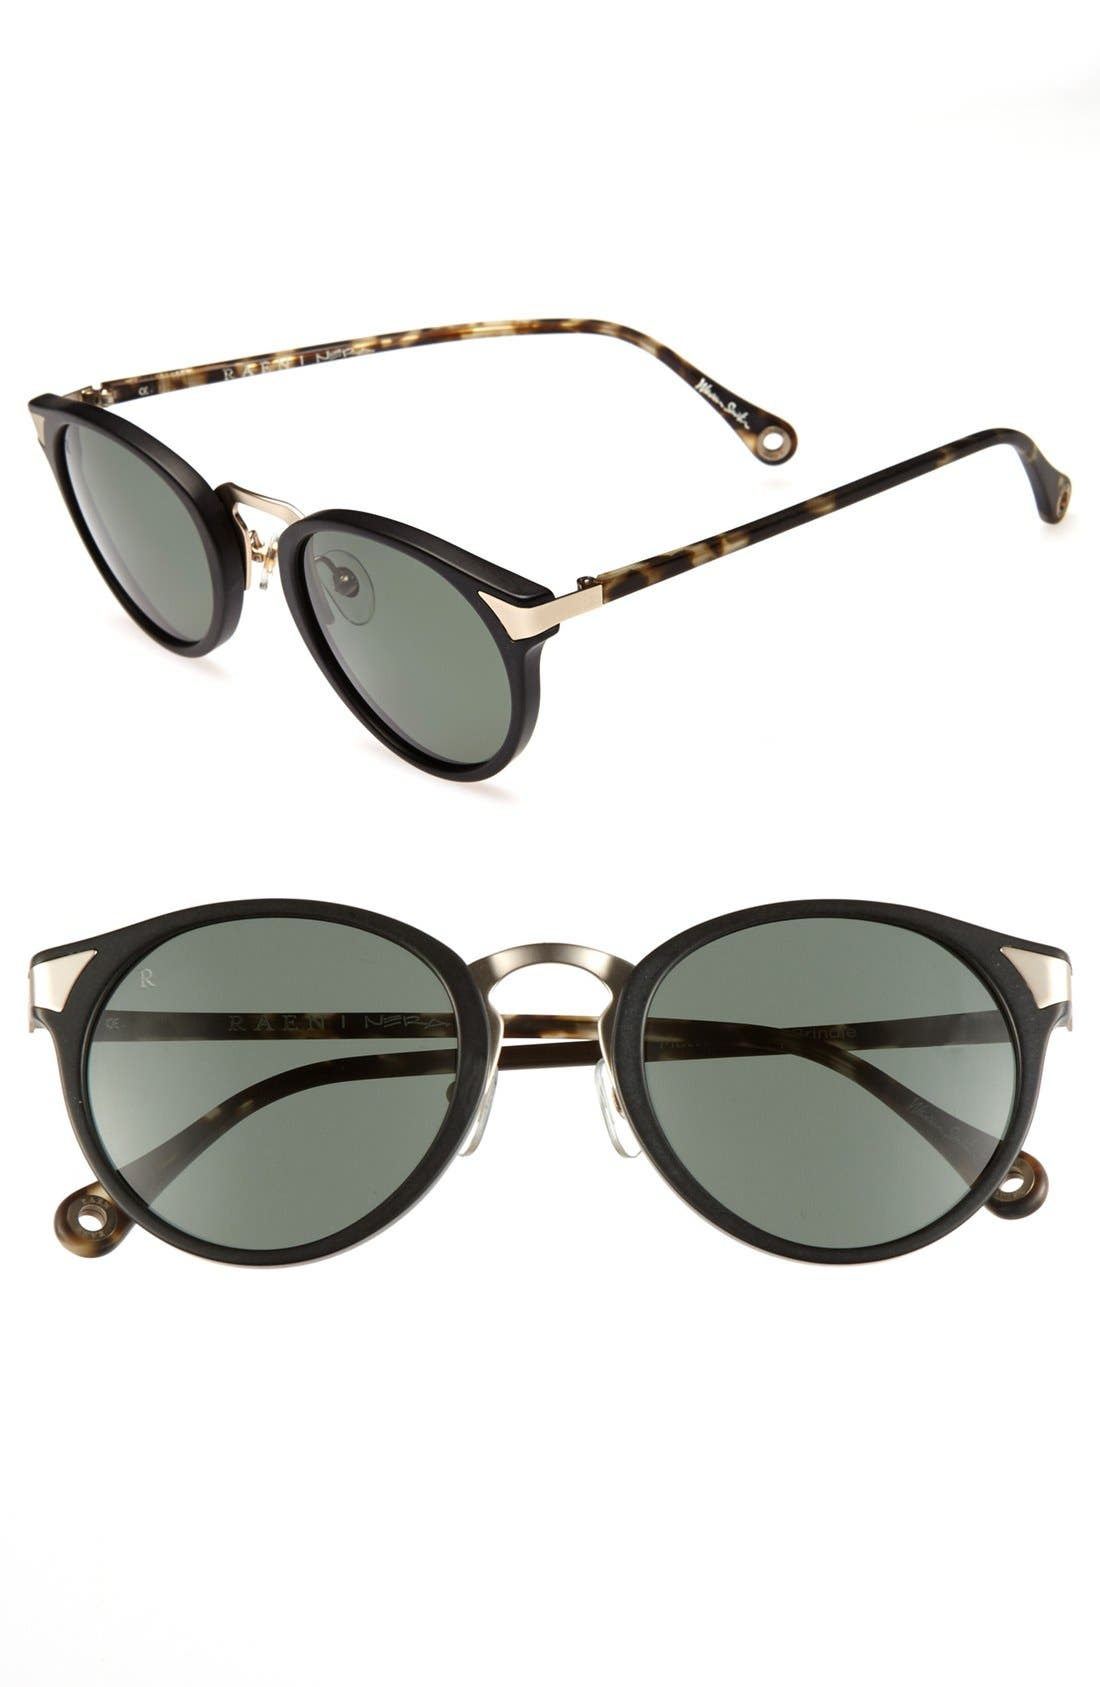 Main Image - RAEN 'Nera' 50mm Polarized Sunglasses